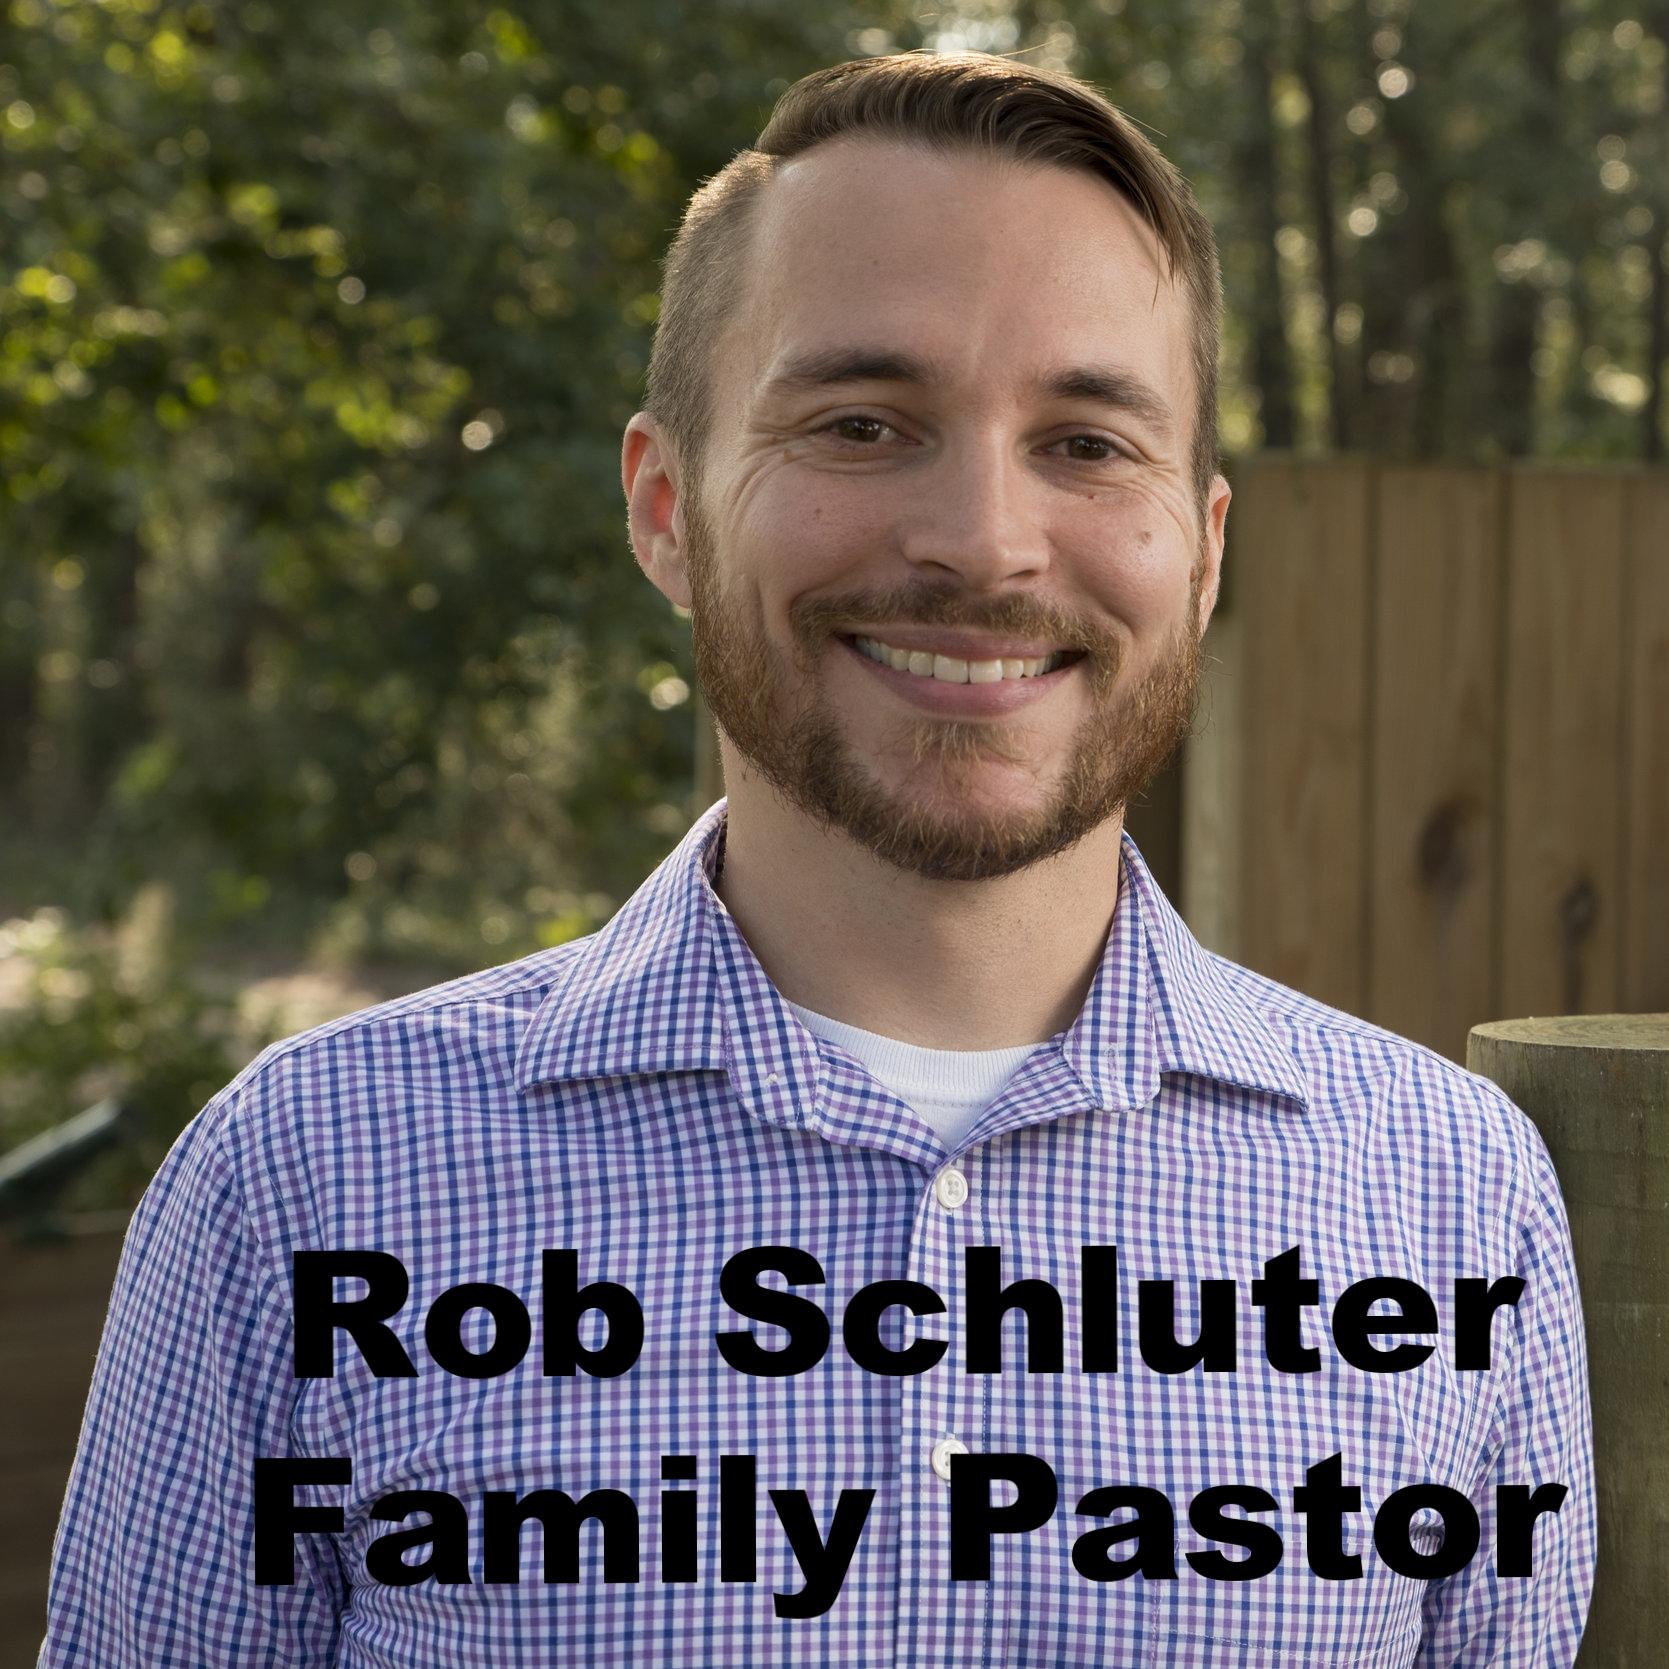 Rob SchluterFamily Pastor - rob@stjohnsparish.net